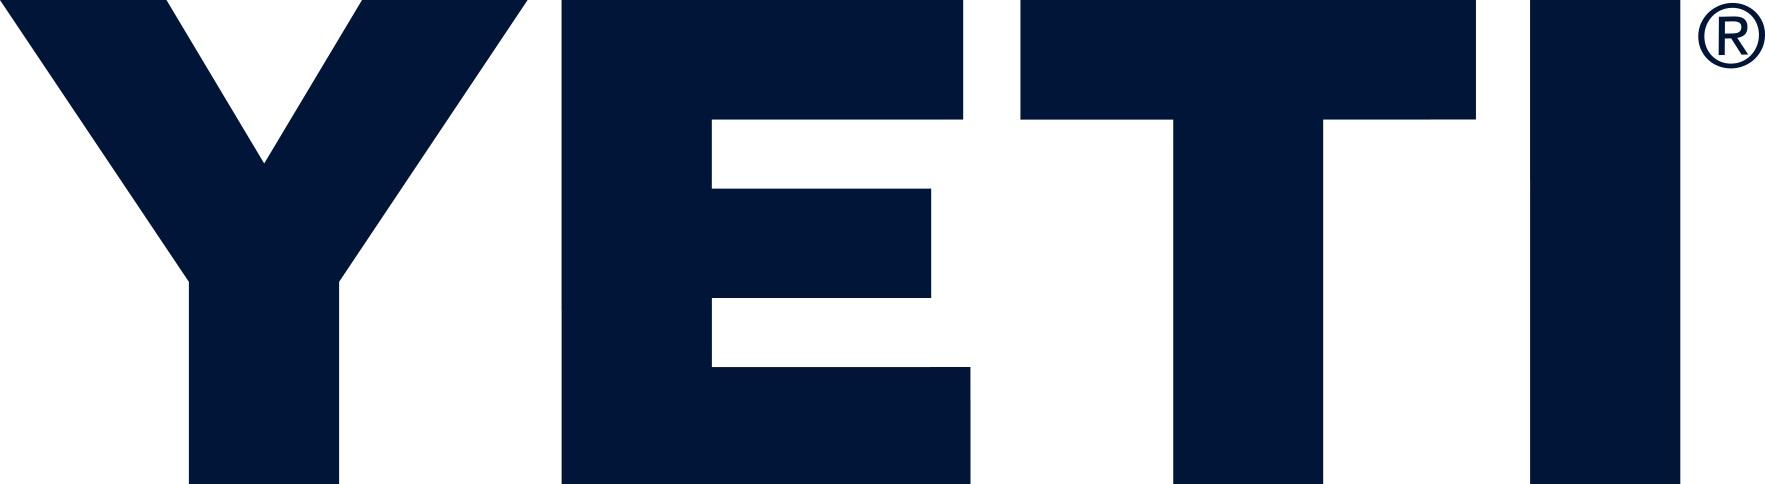 Navy-YETI-Logo-RGB-Web.jpg